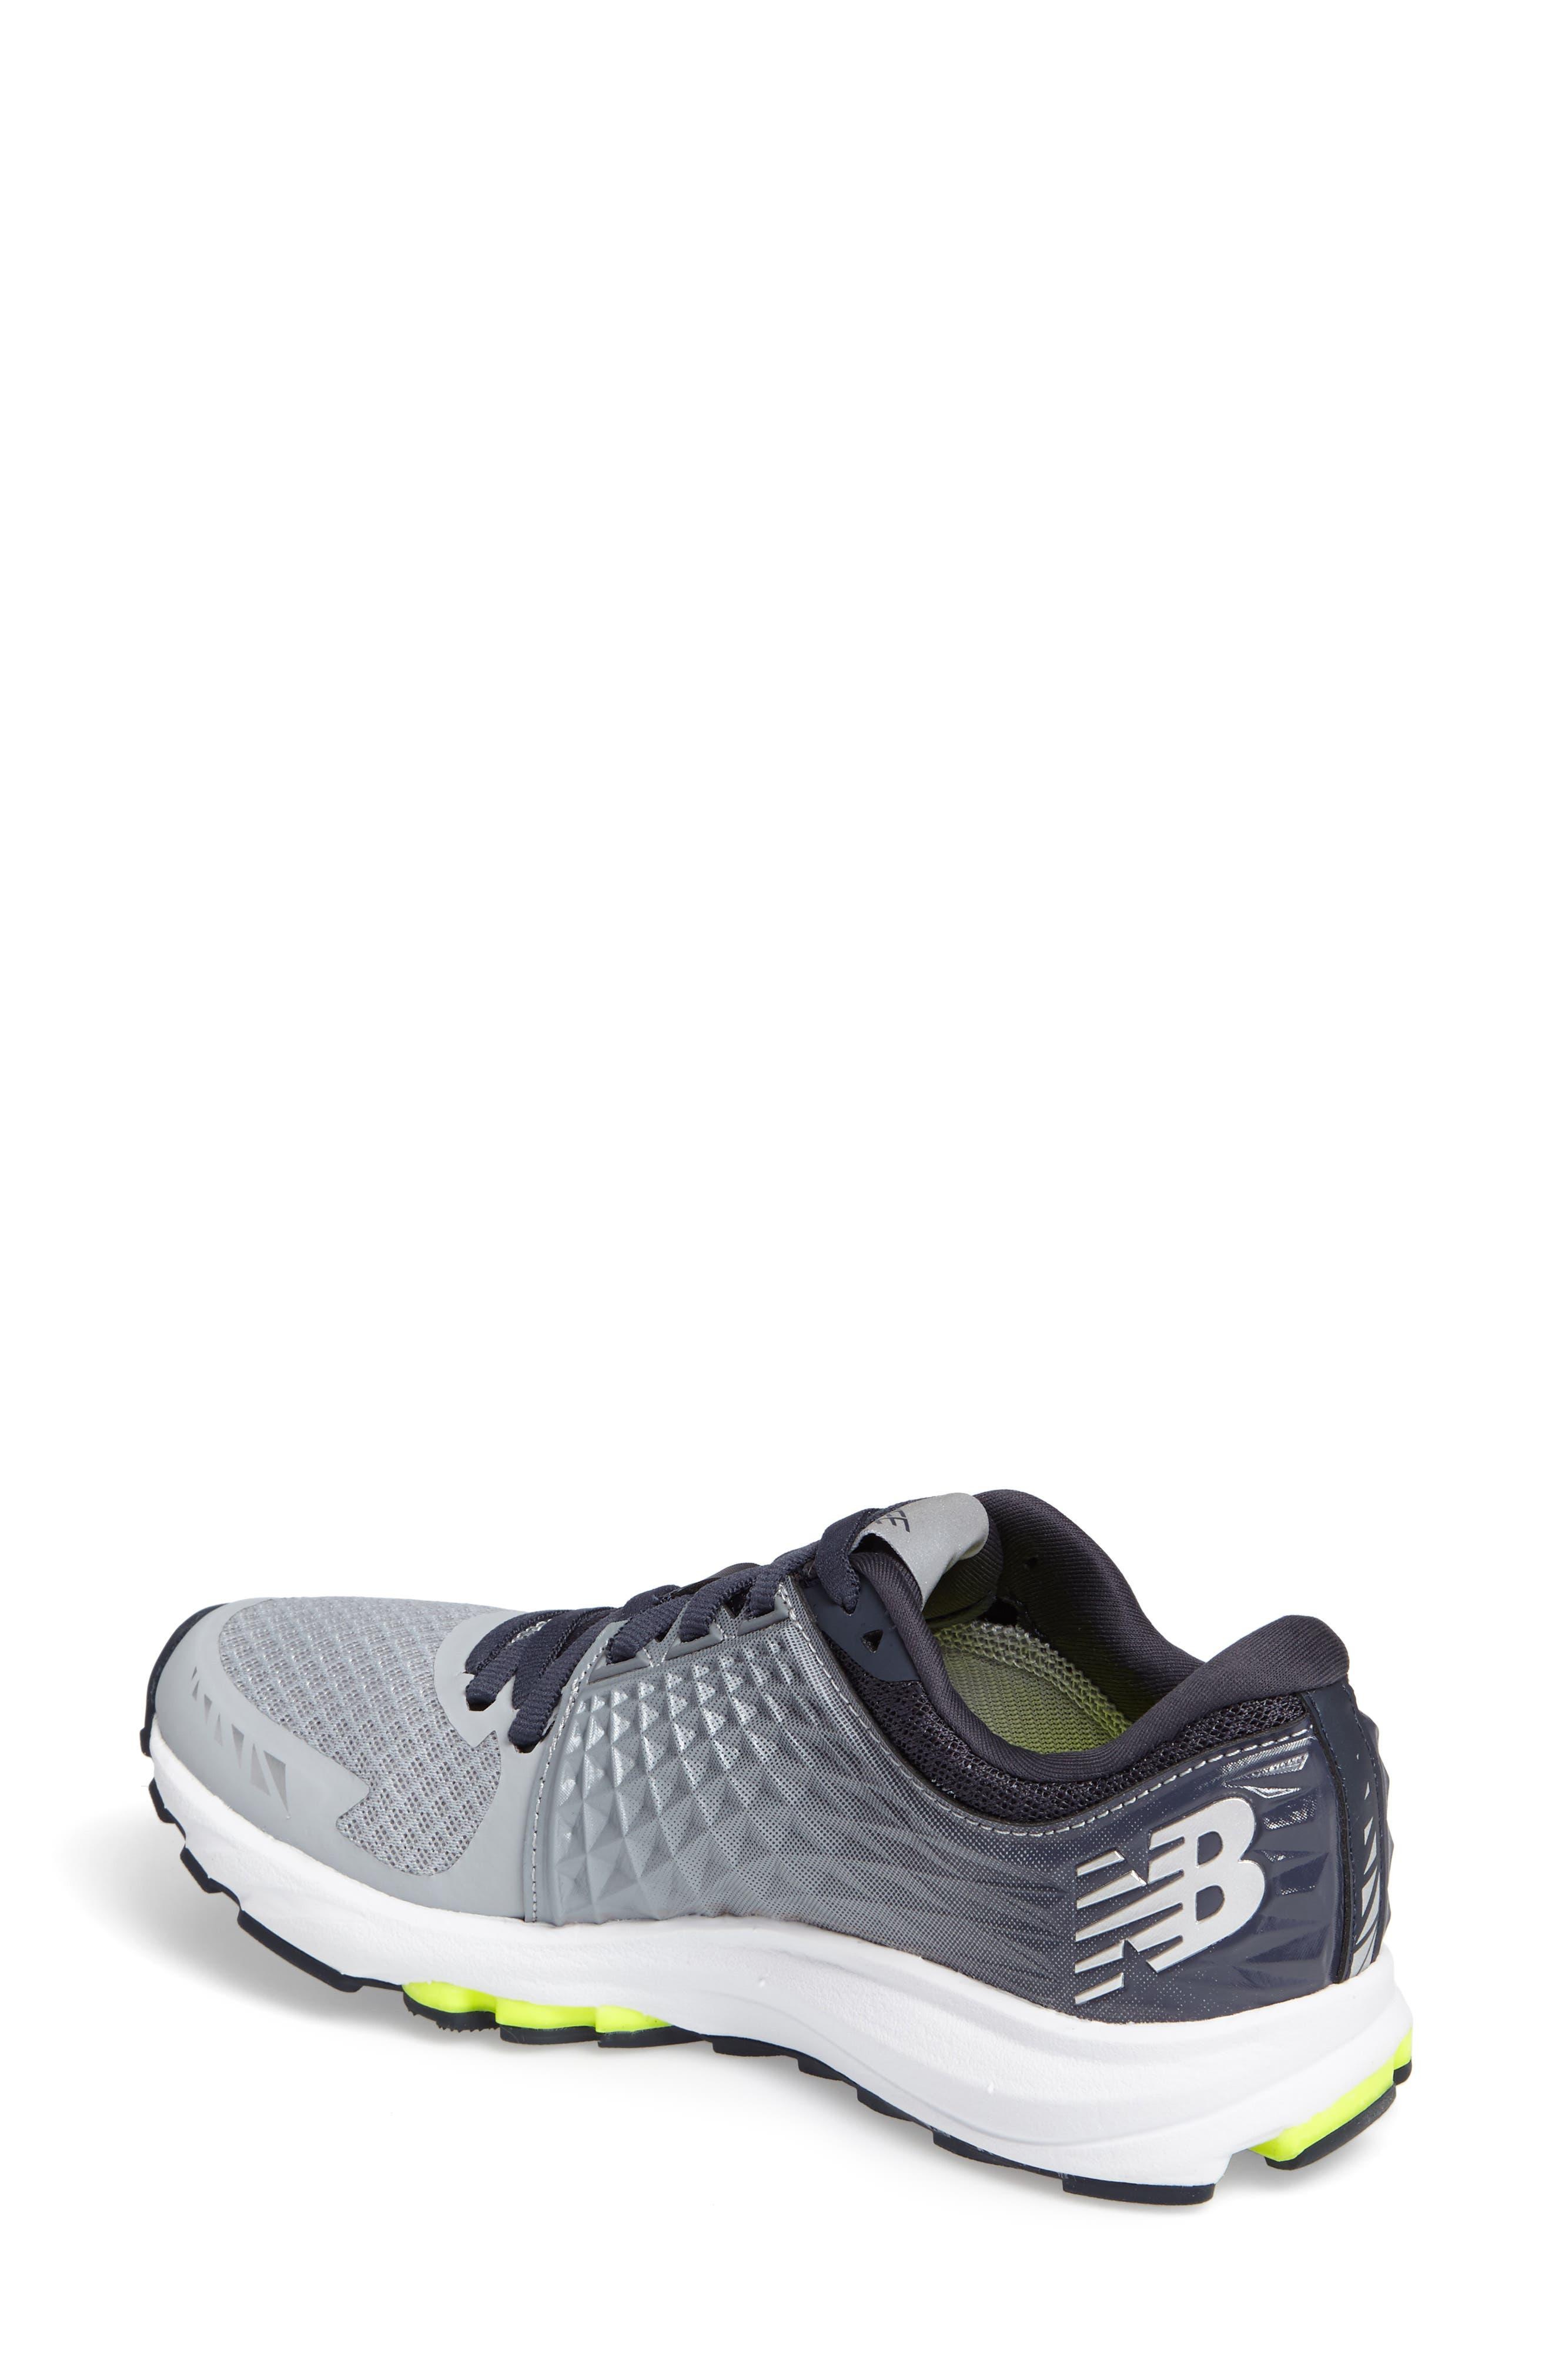 Vazee 2090 Running Shoe,                             Alternate thumbnail 2, color,                             030